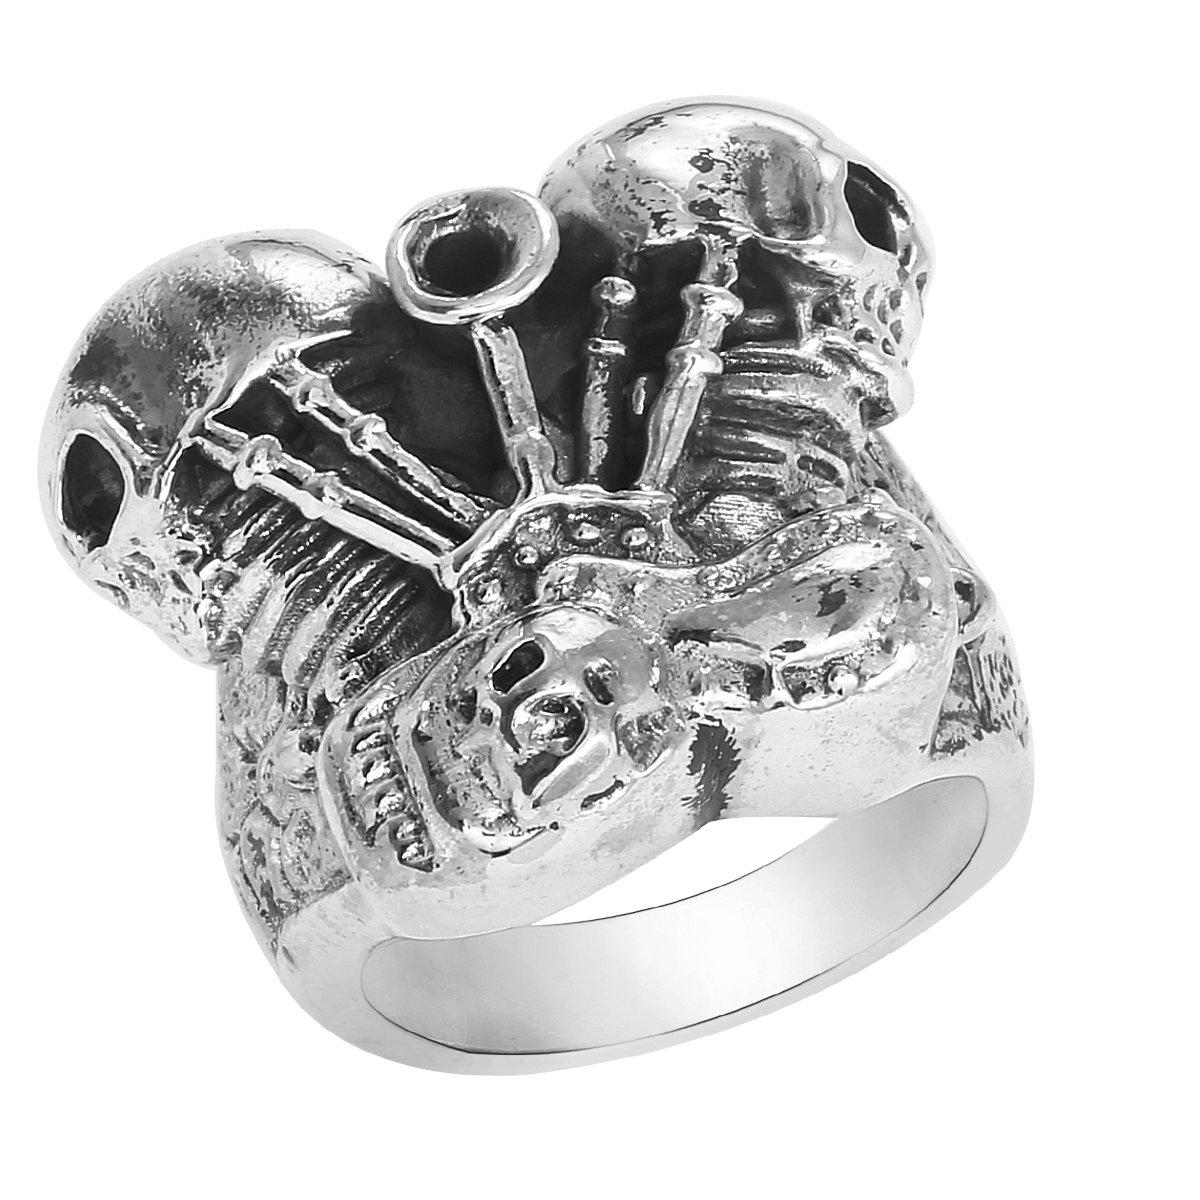 Harley Davidson Wedding Rings.925 Sterling Silver Harley Davidson Ring Panhead Engine Biker Ring Twin Head Mc